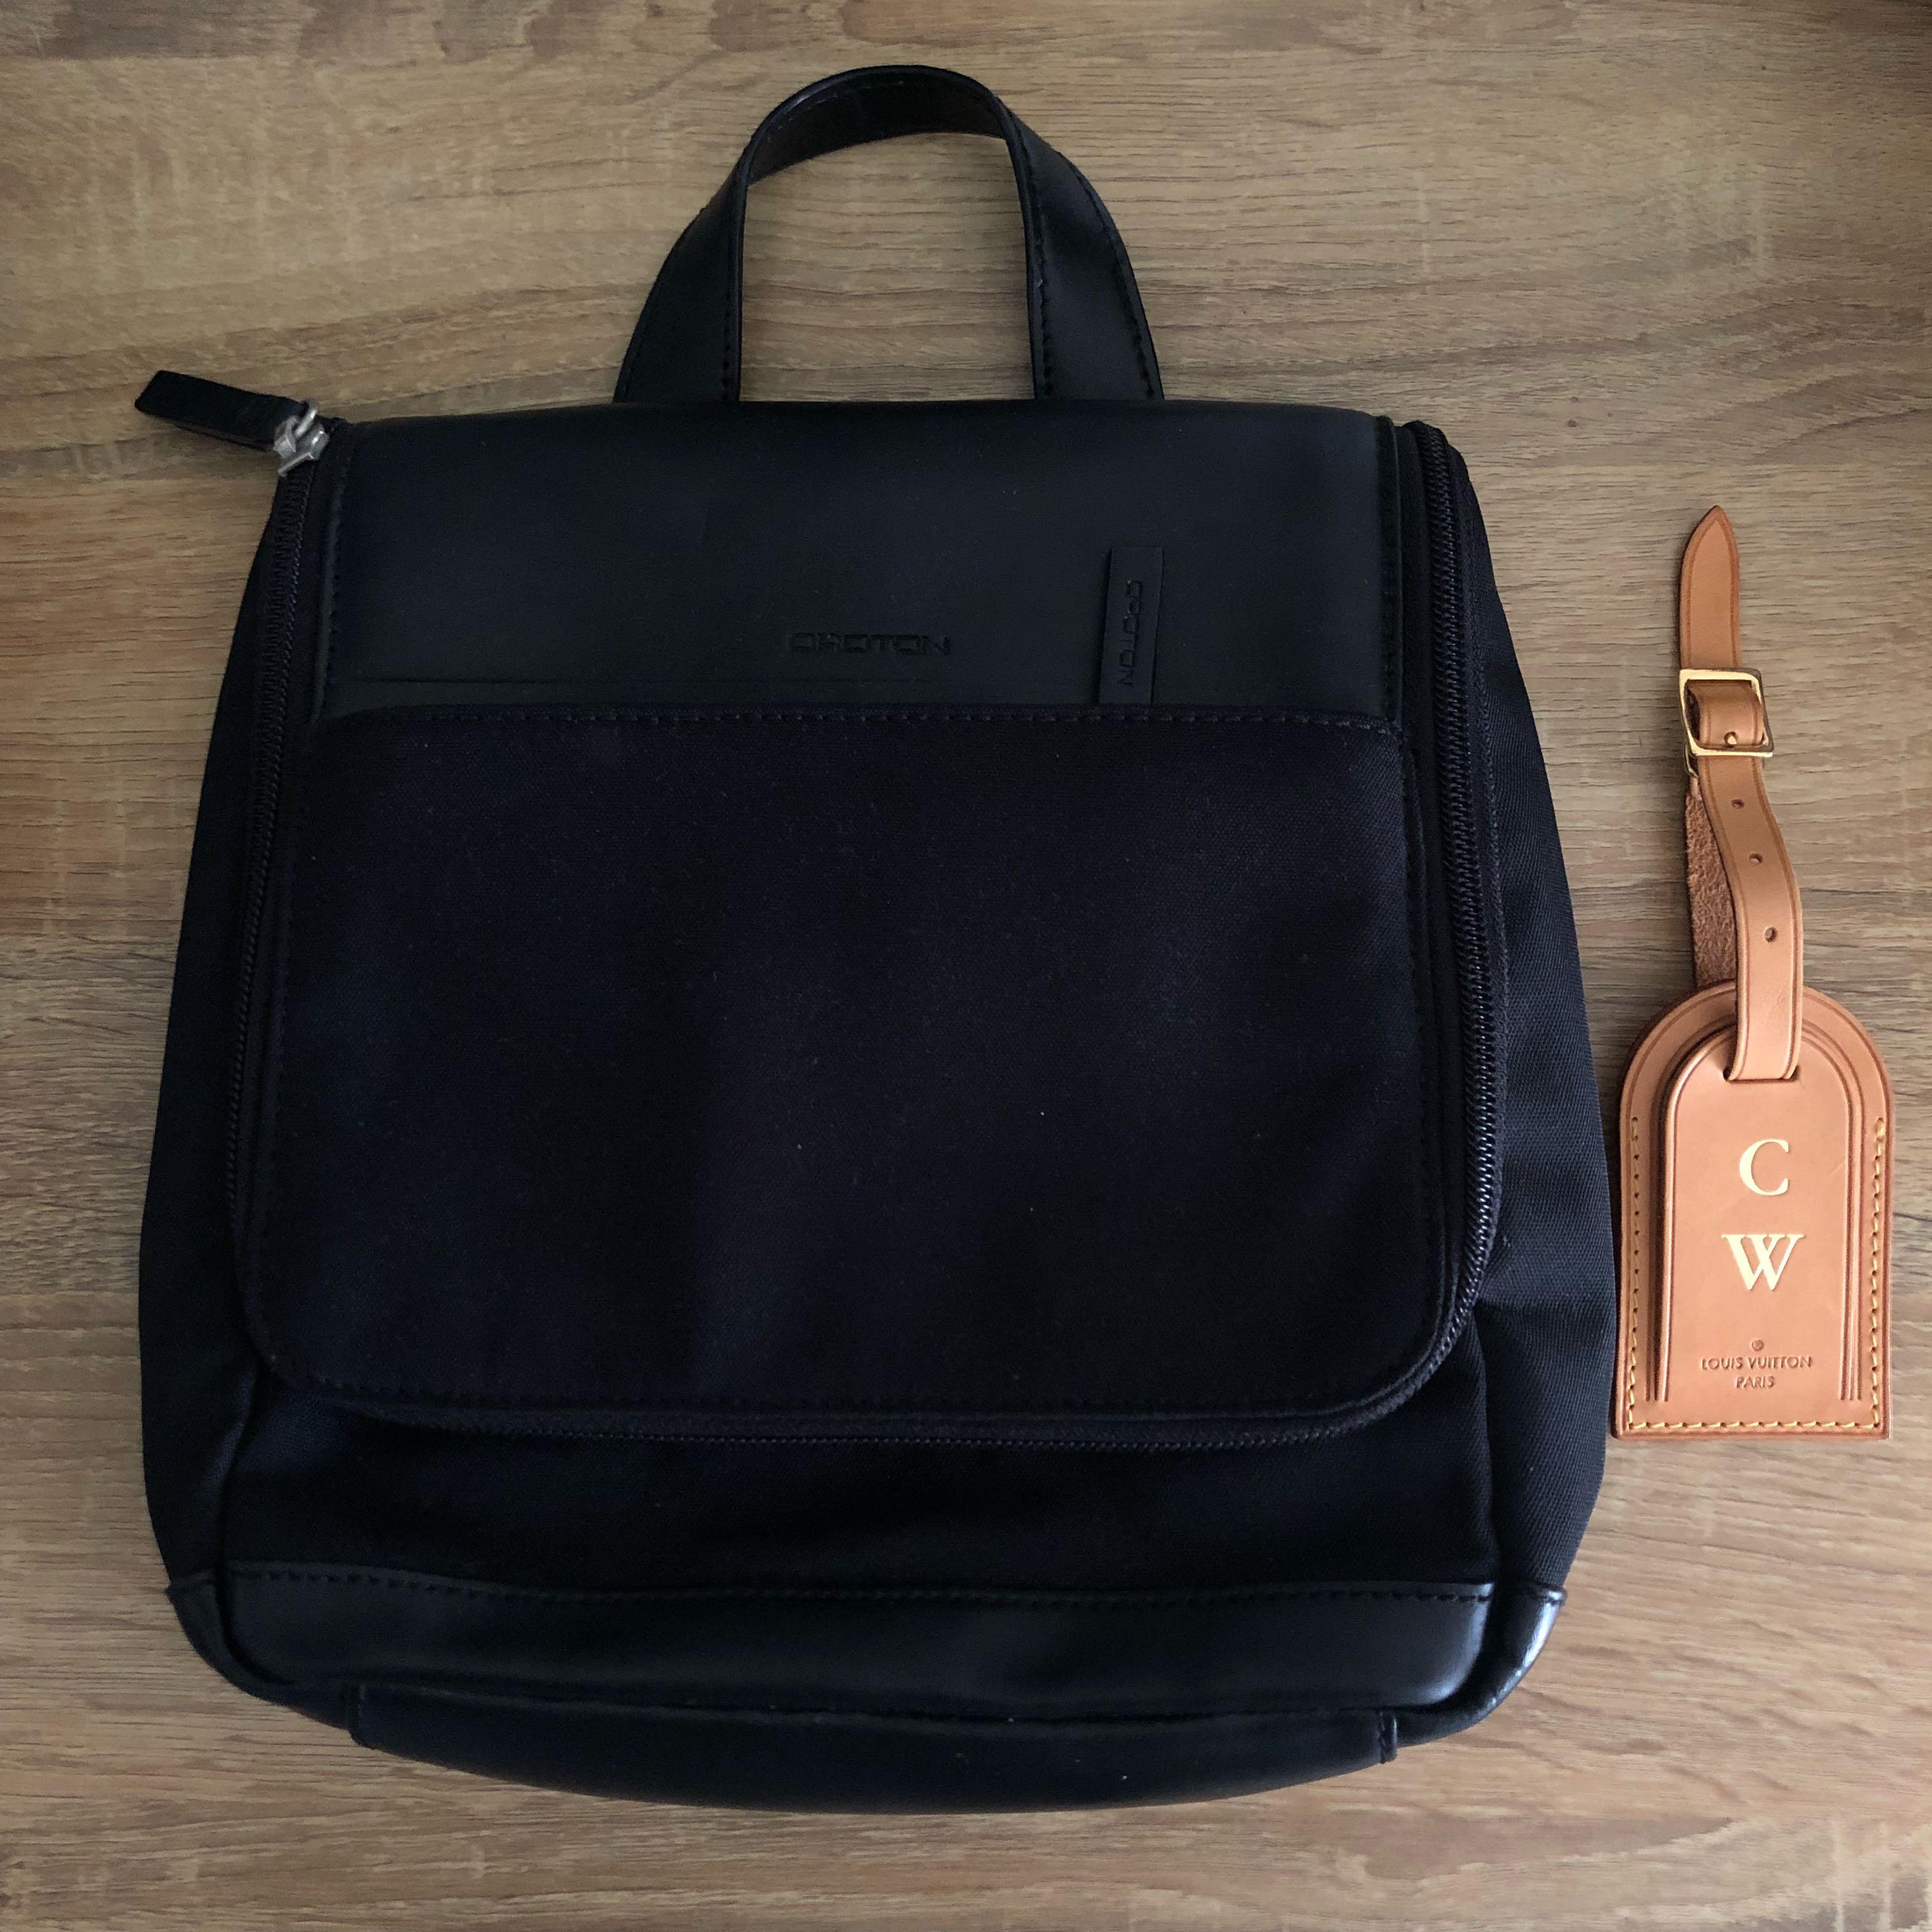 b3d8f3bbb42b Oroton BNWOT mens or womens travel toiletry bag - black leather ...